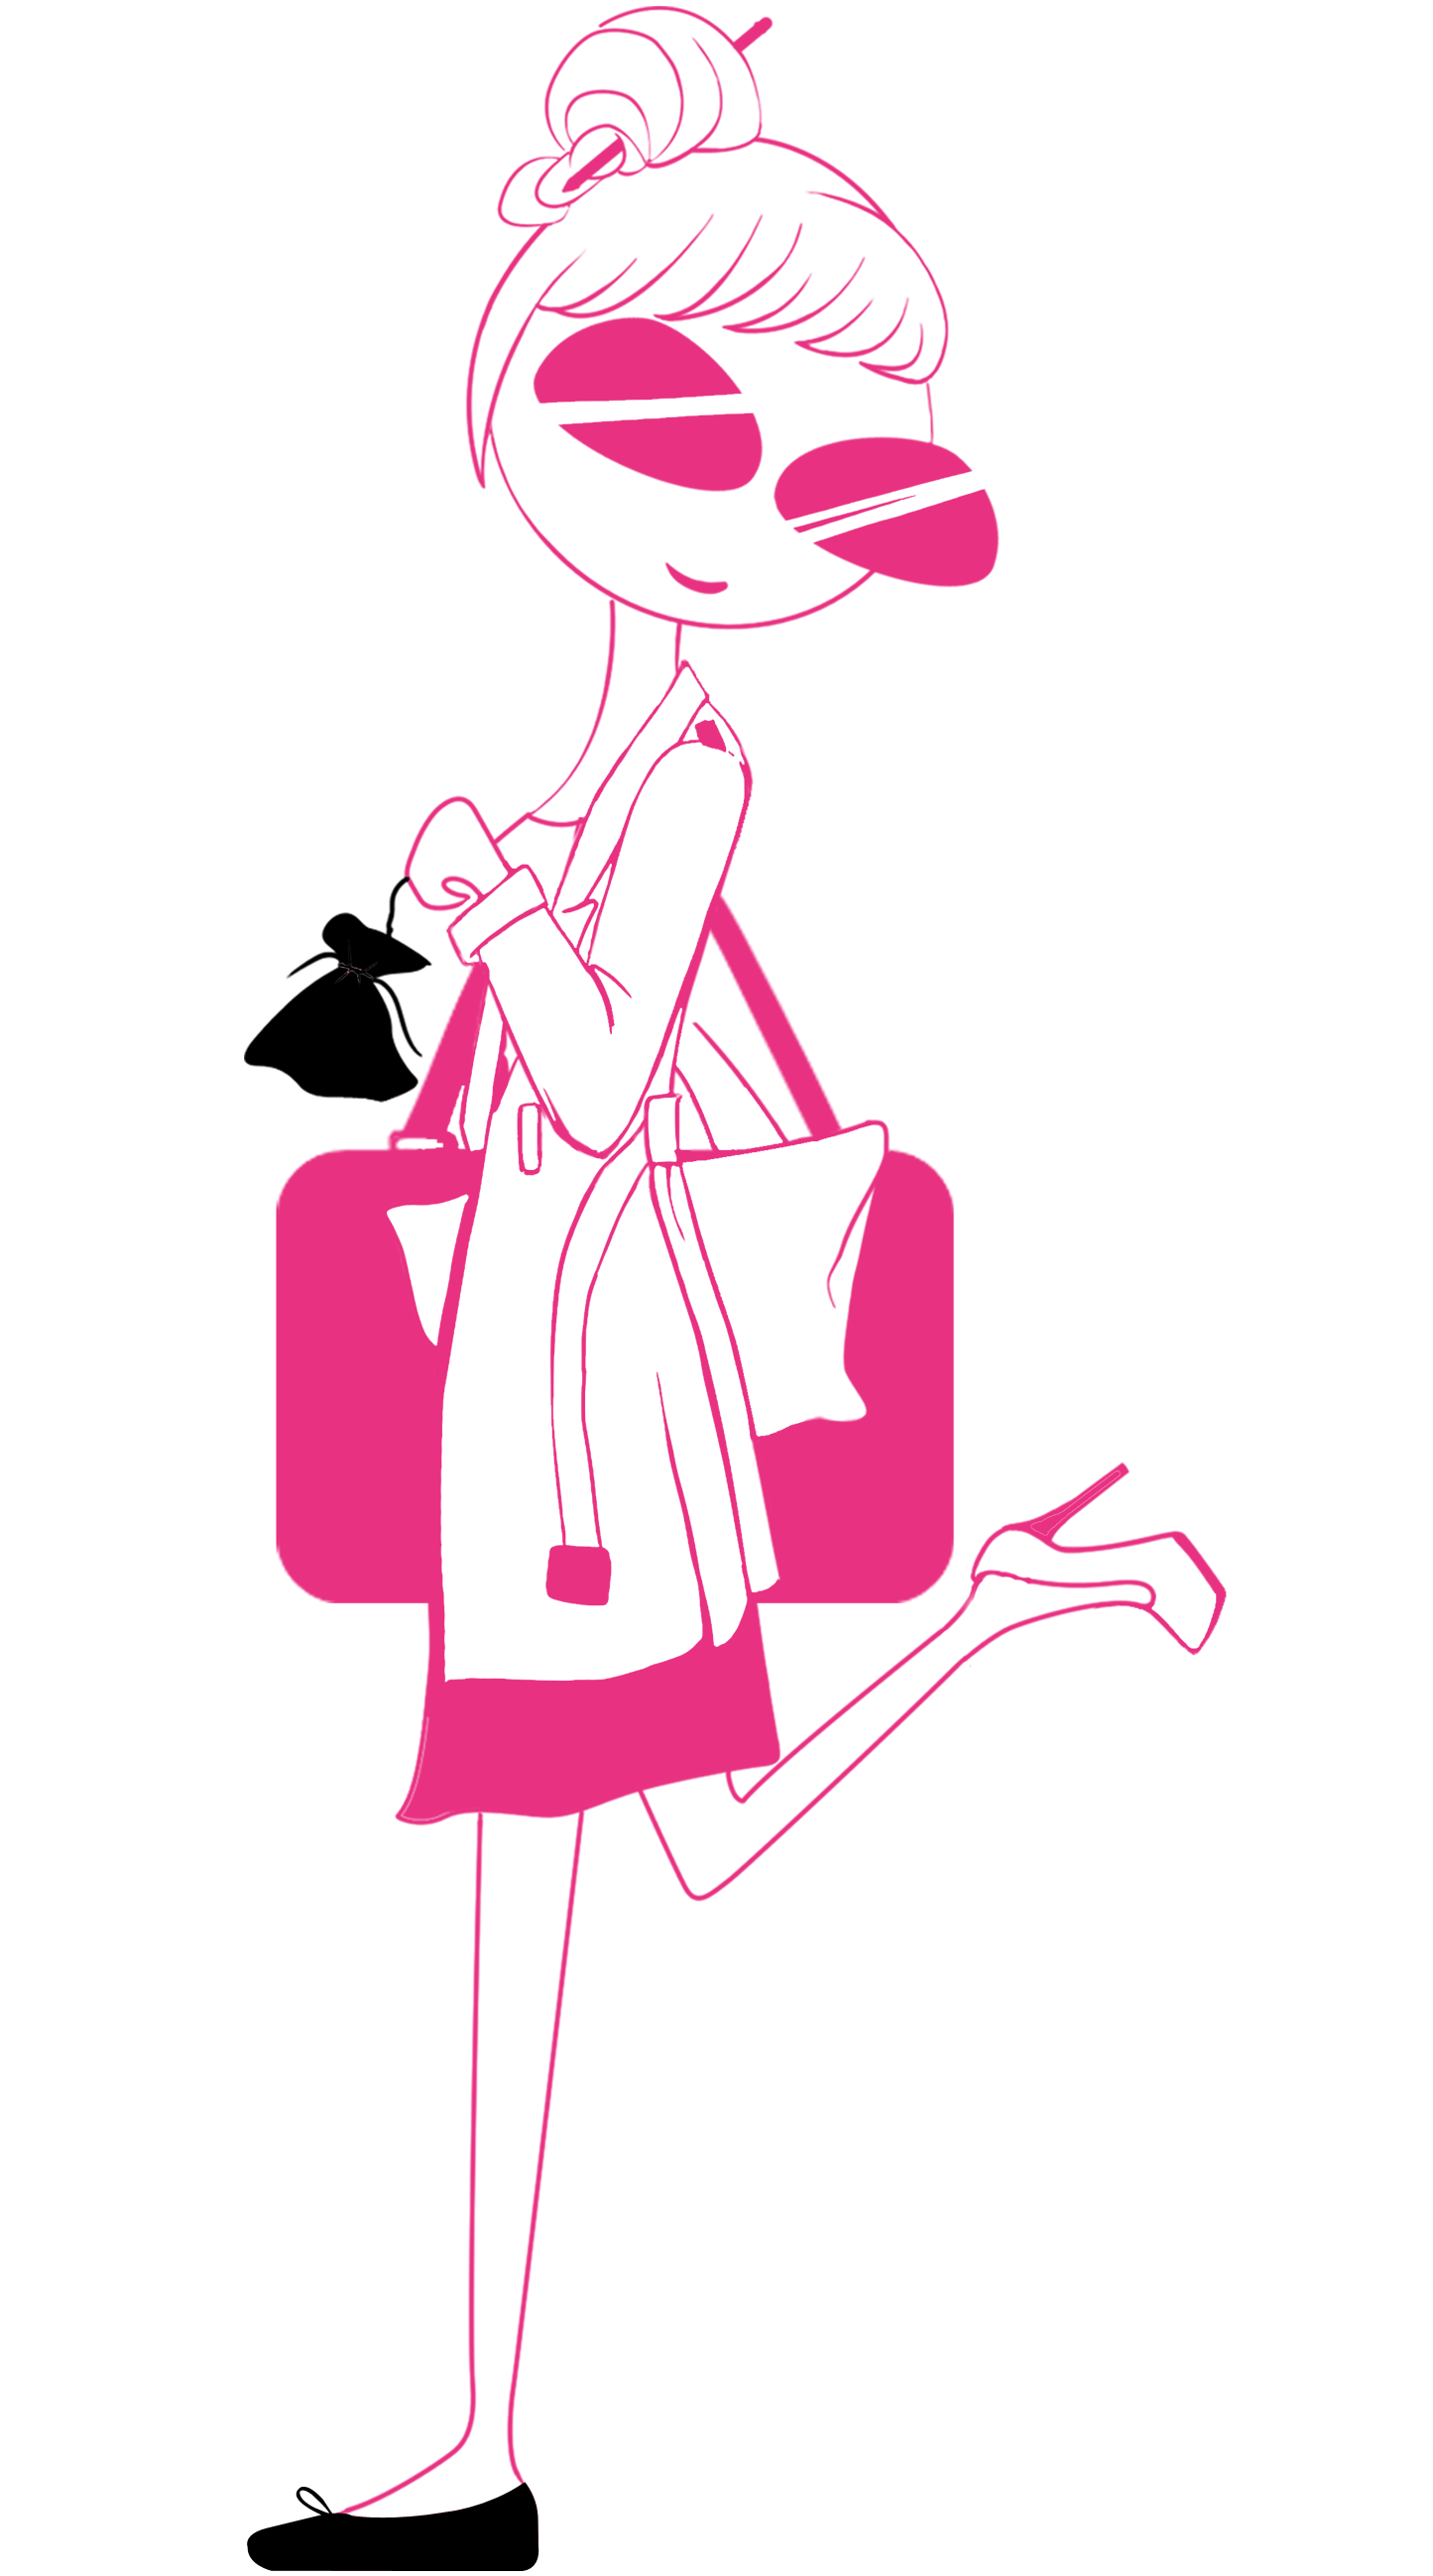 Miss Shoette - Working woman - rose